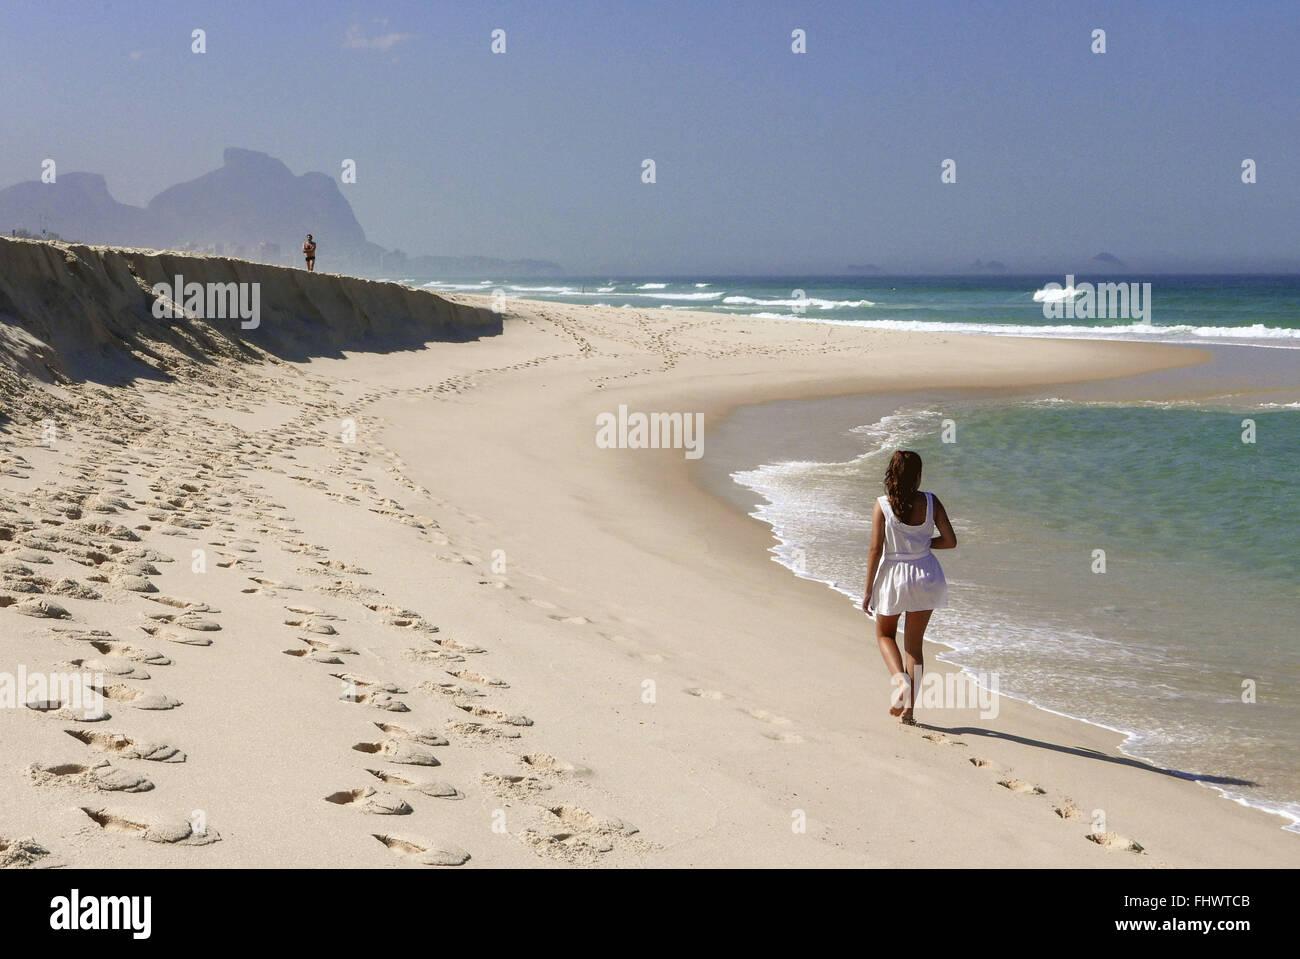 Adolescente caminhando na Praia da Reserva na Barra da Tijuca Immagini Stock